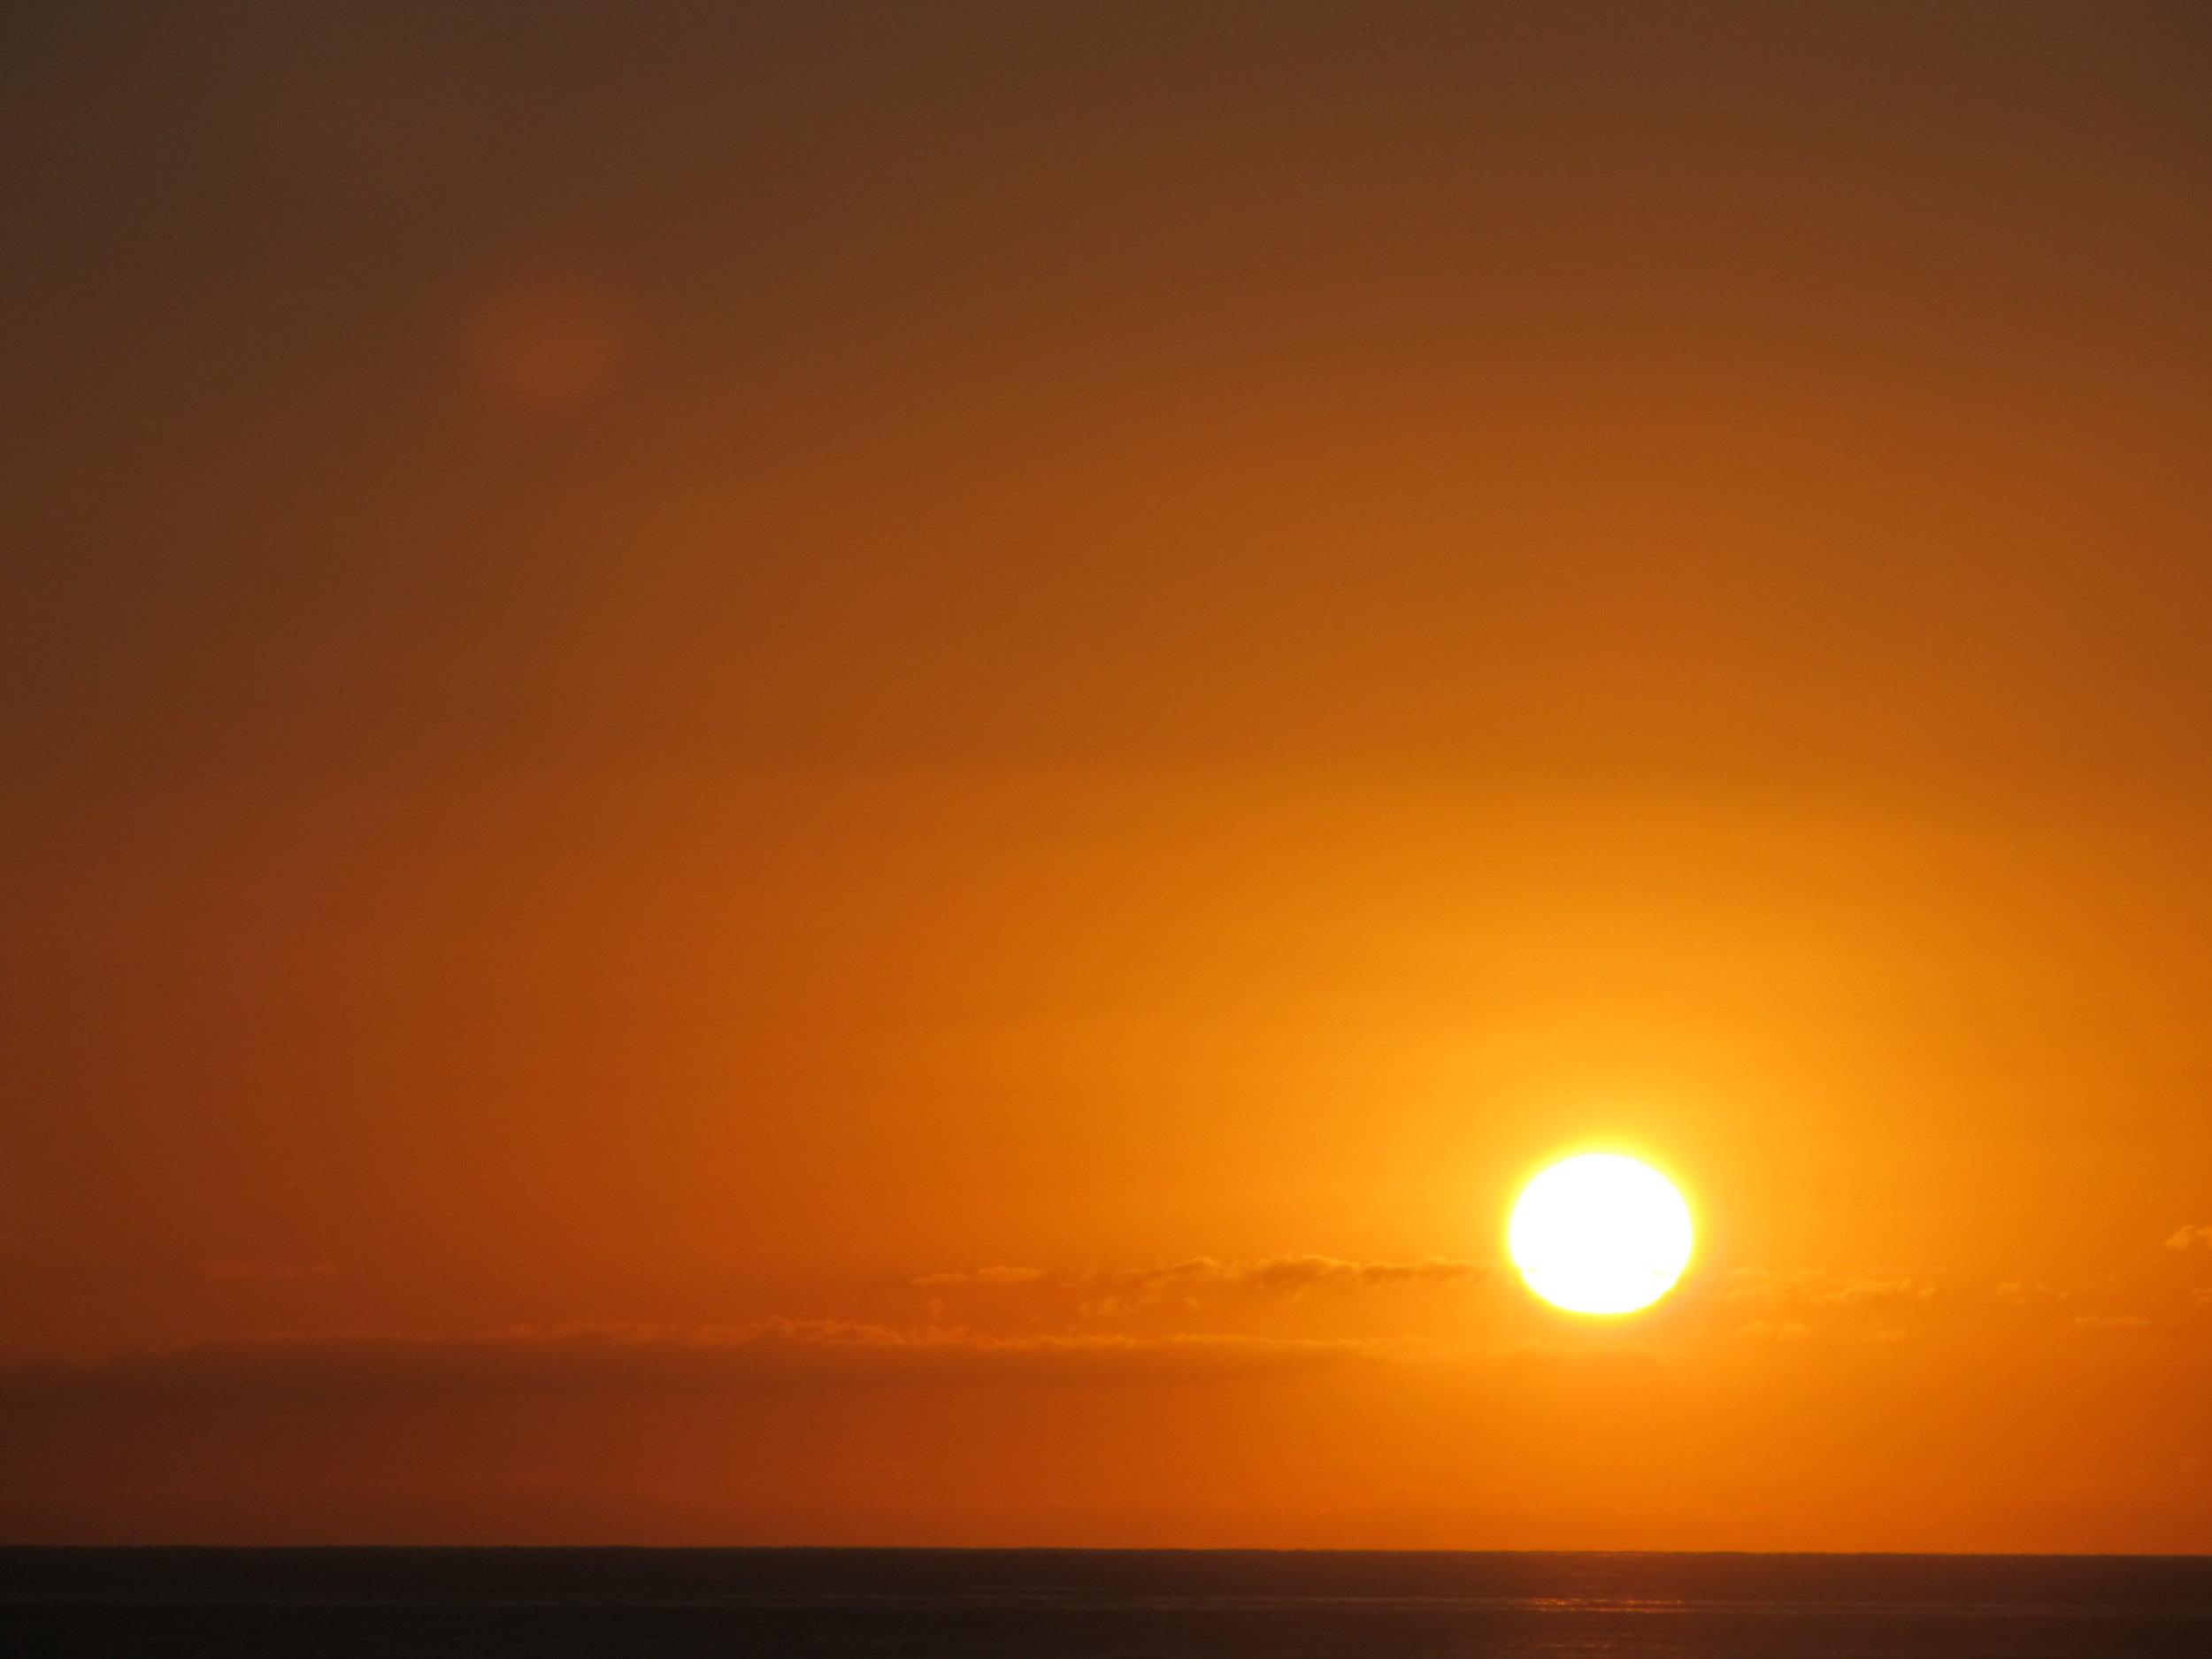 orange sunset at sea